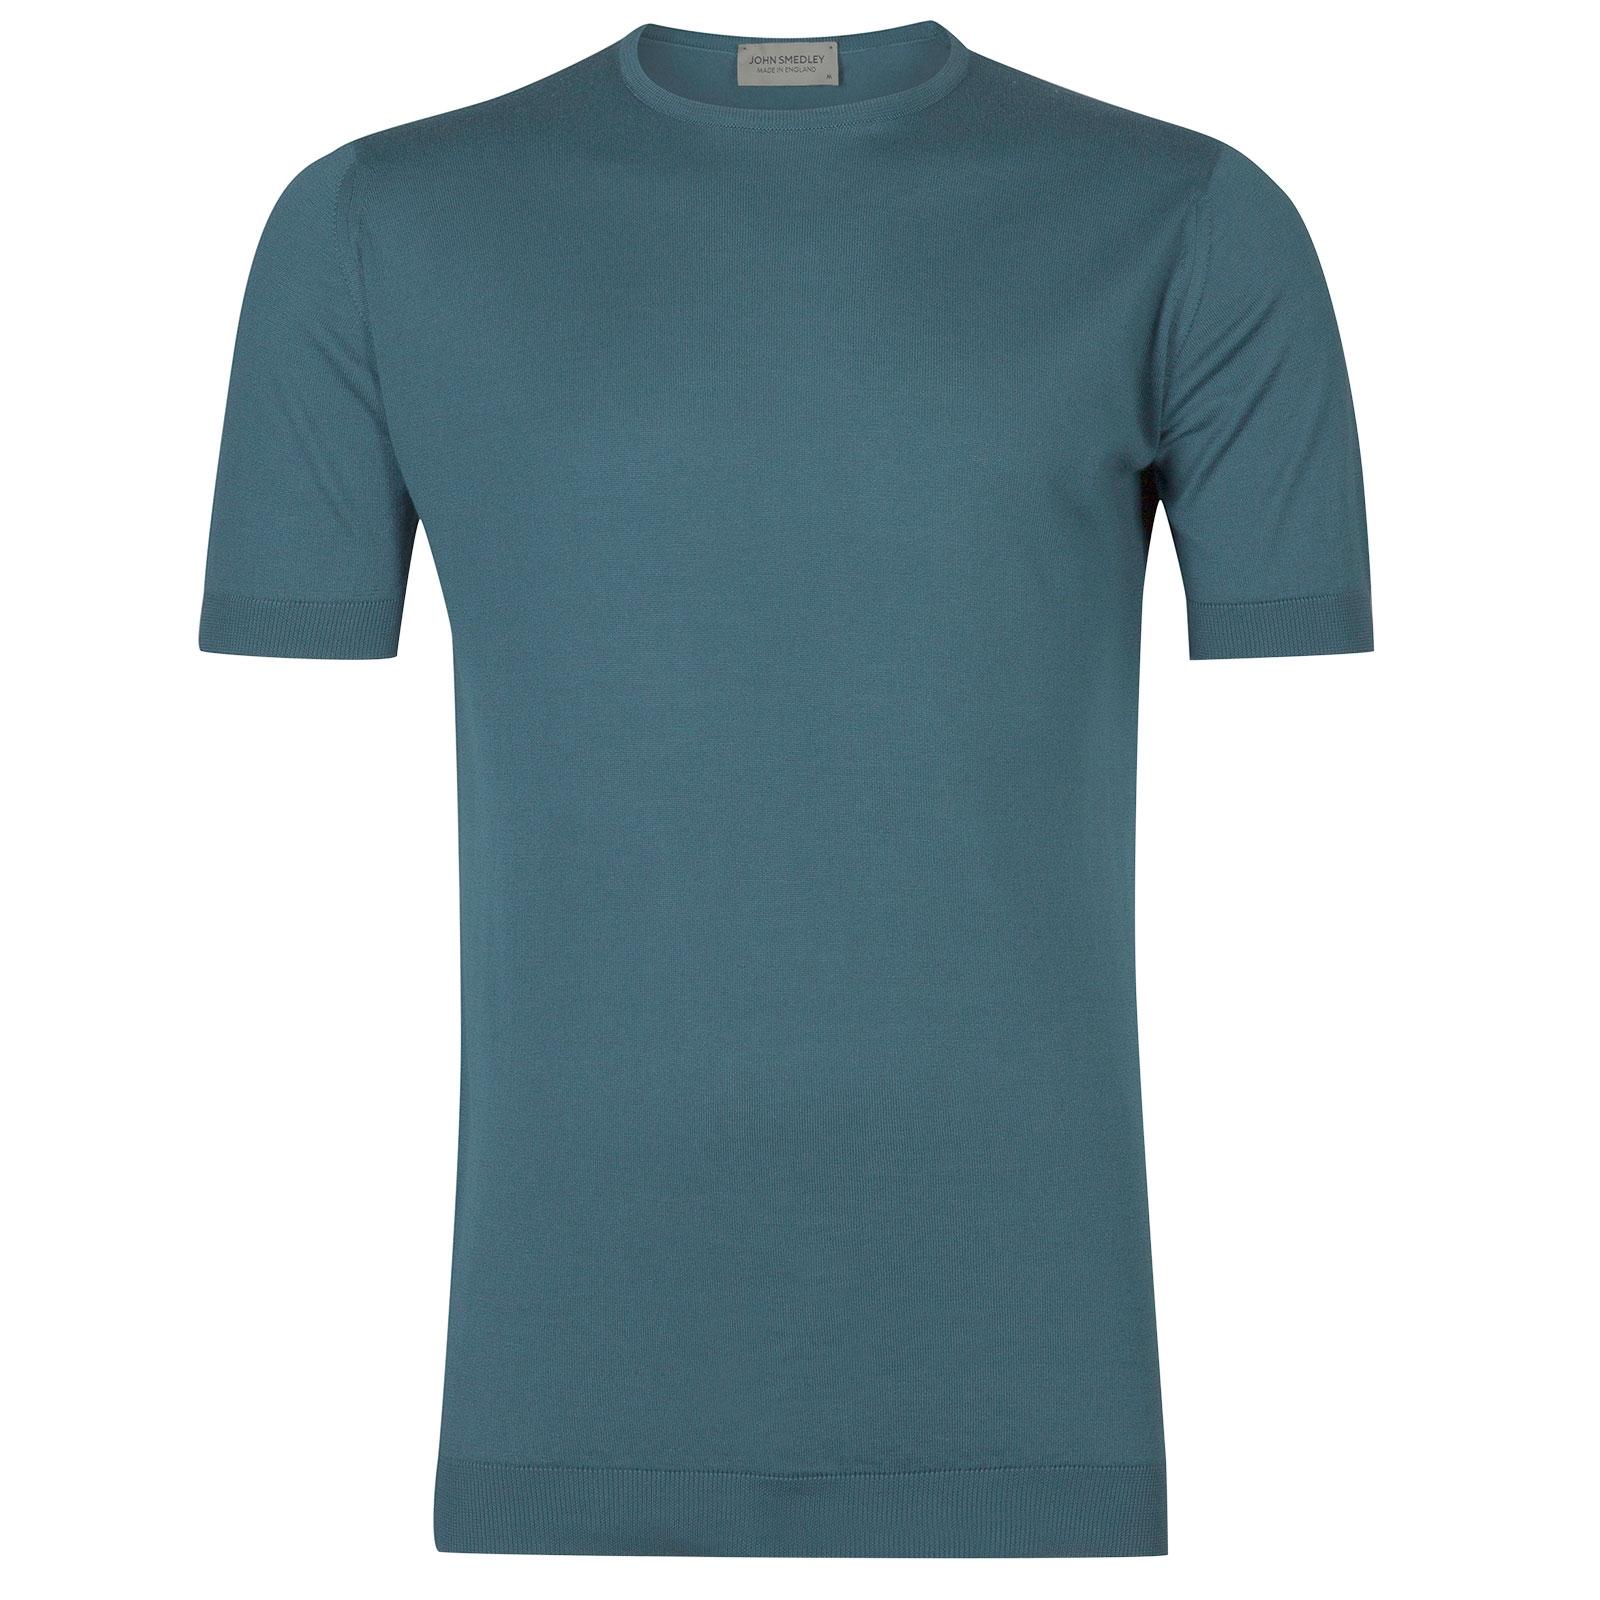 John Smedley Belden in Dewdrop Blue T-Shirt-SML